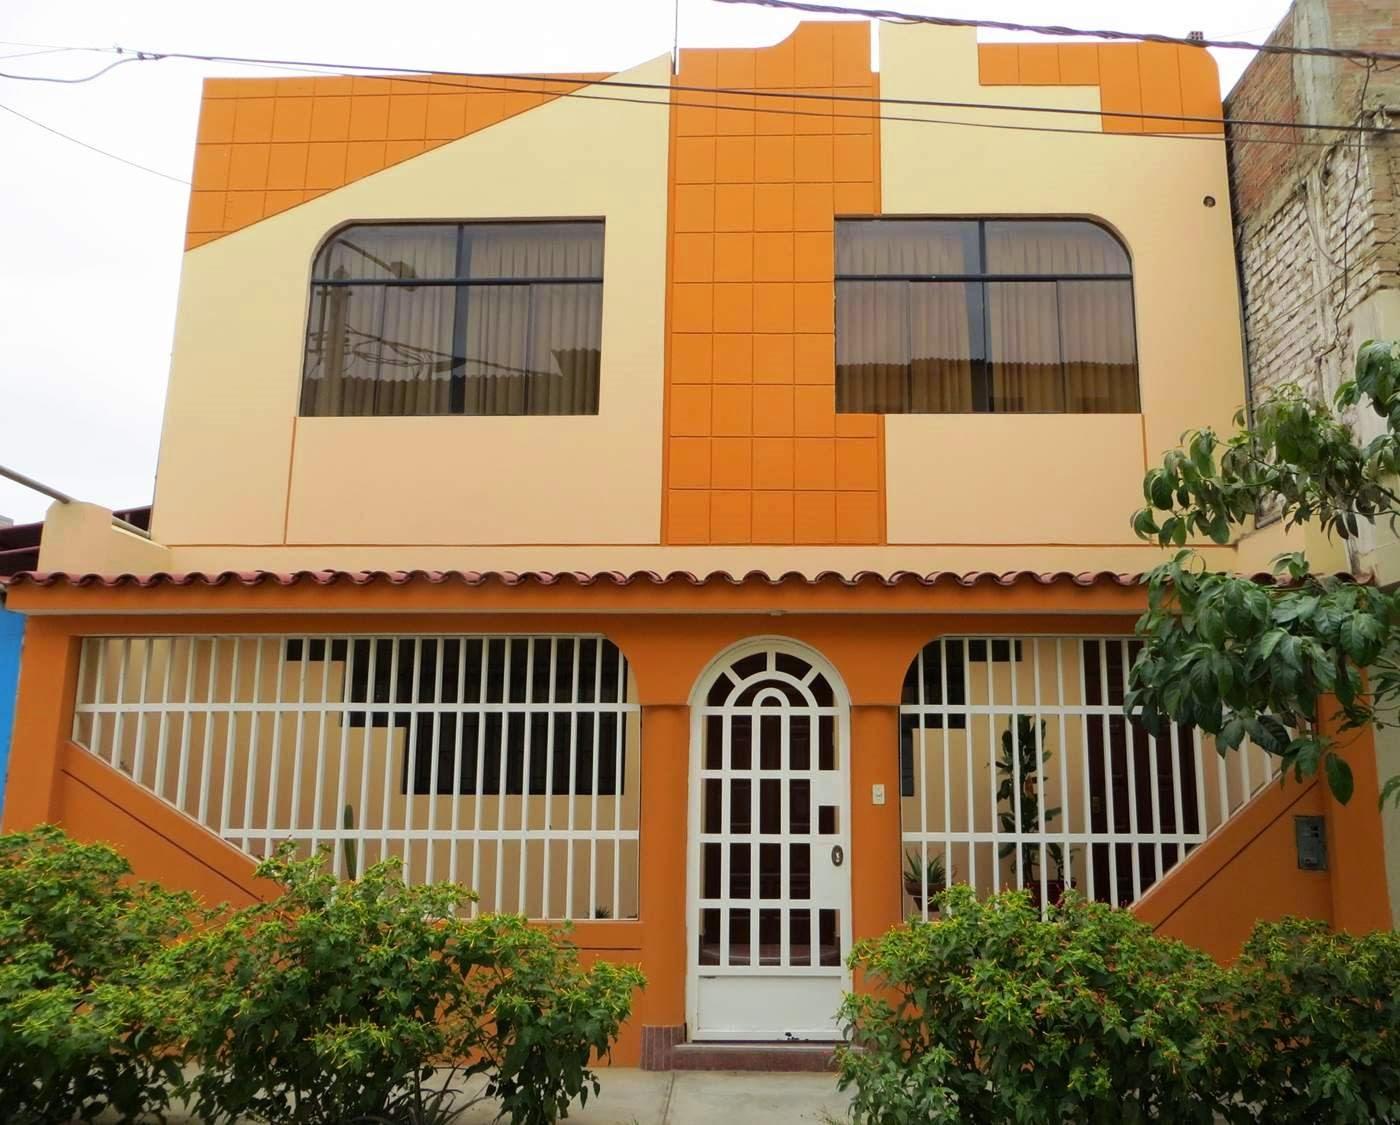 Fachadas y casas noviembre 2014 for Fachadas de casas de dos pisos sencillas